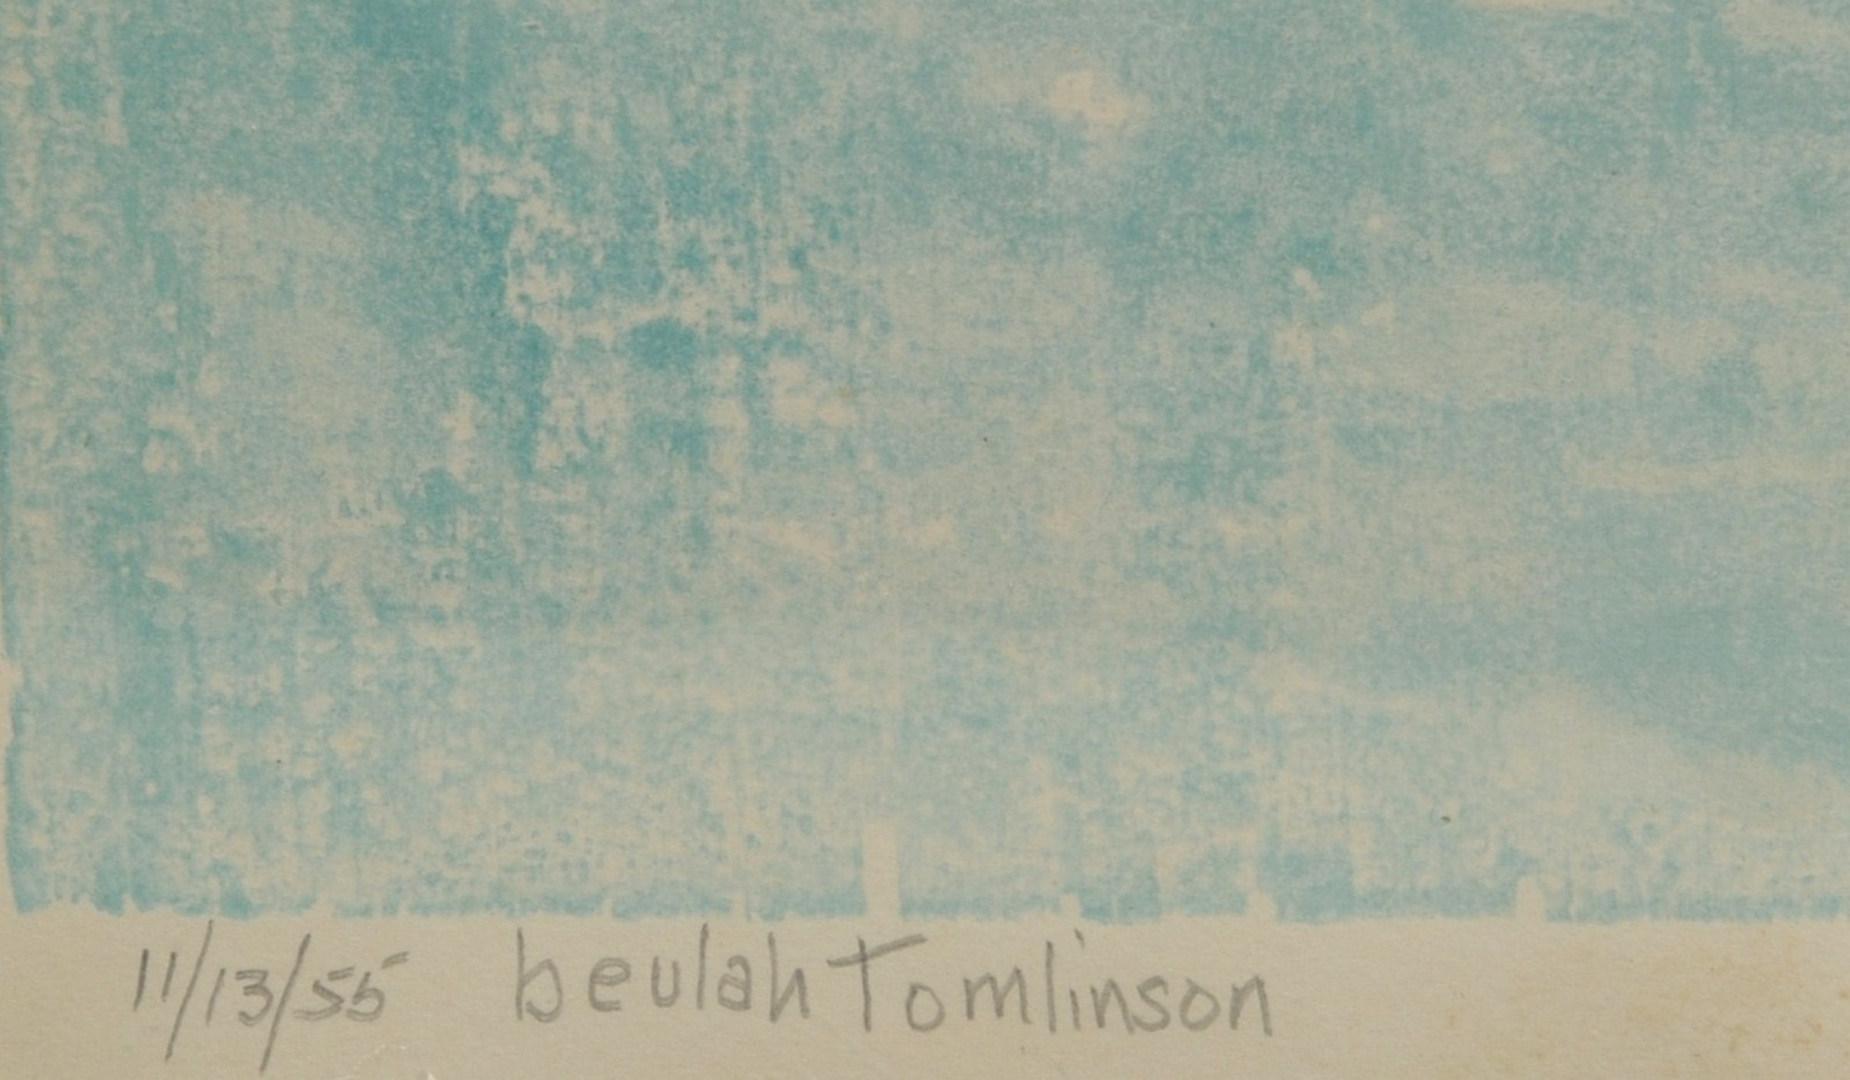 Lot 338: 2 Beulah Tomlinson Wood Cut Block Prints: Sailboat